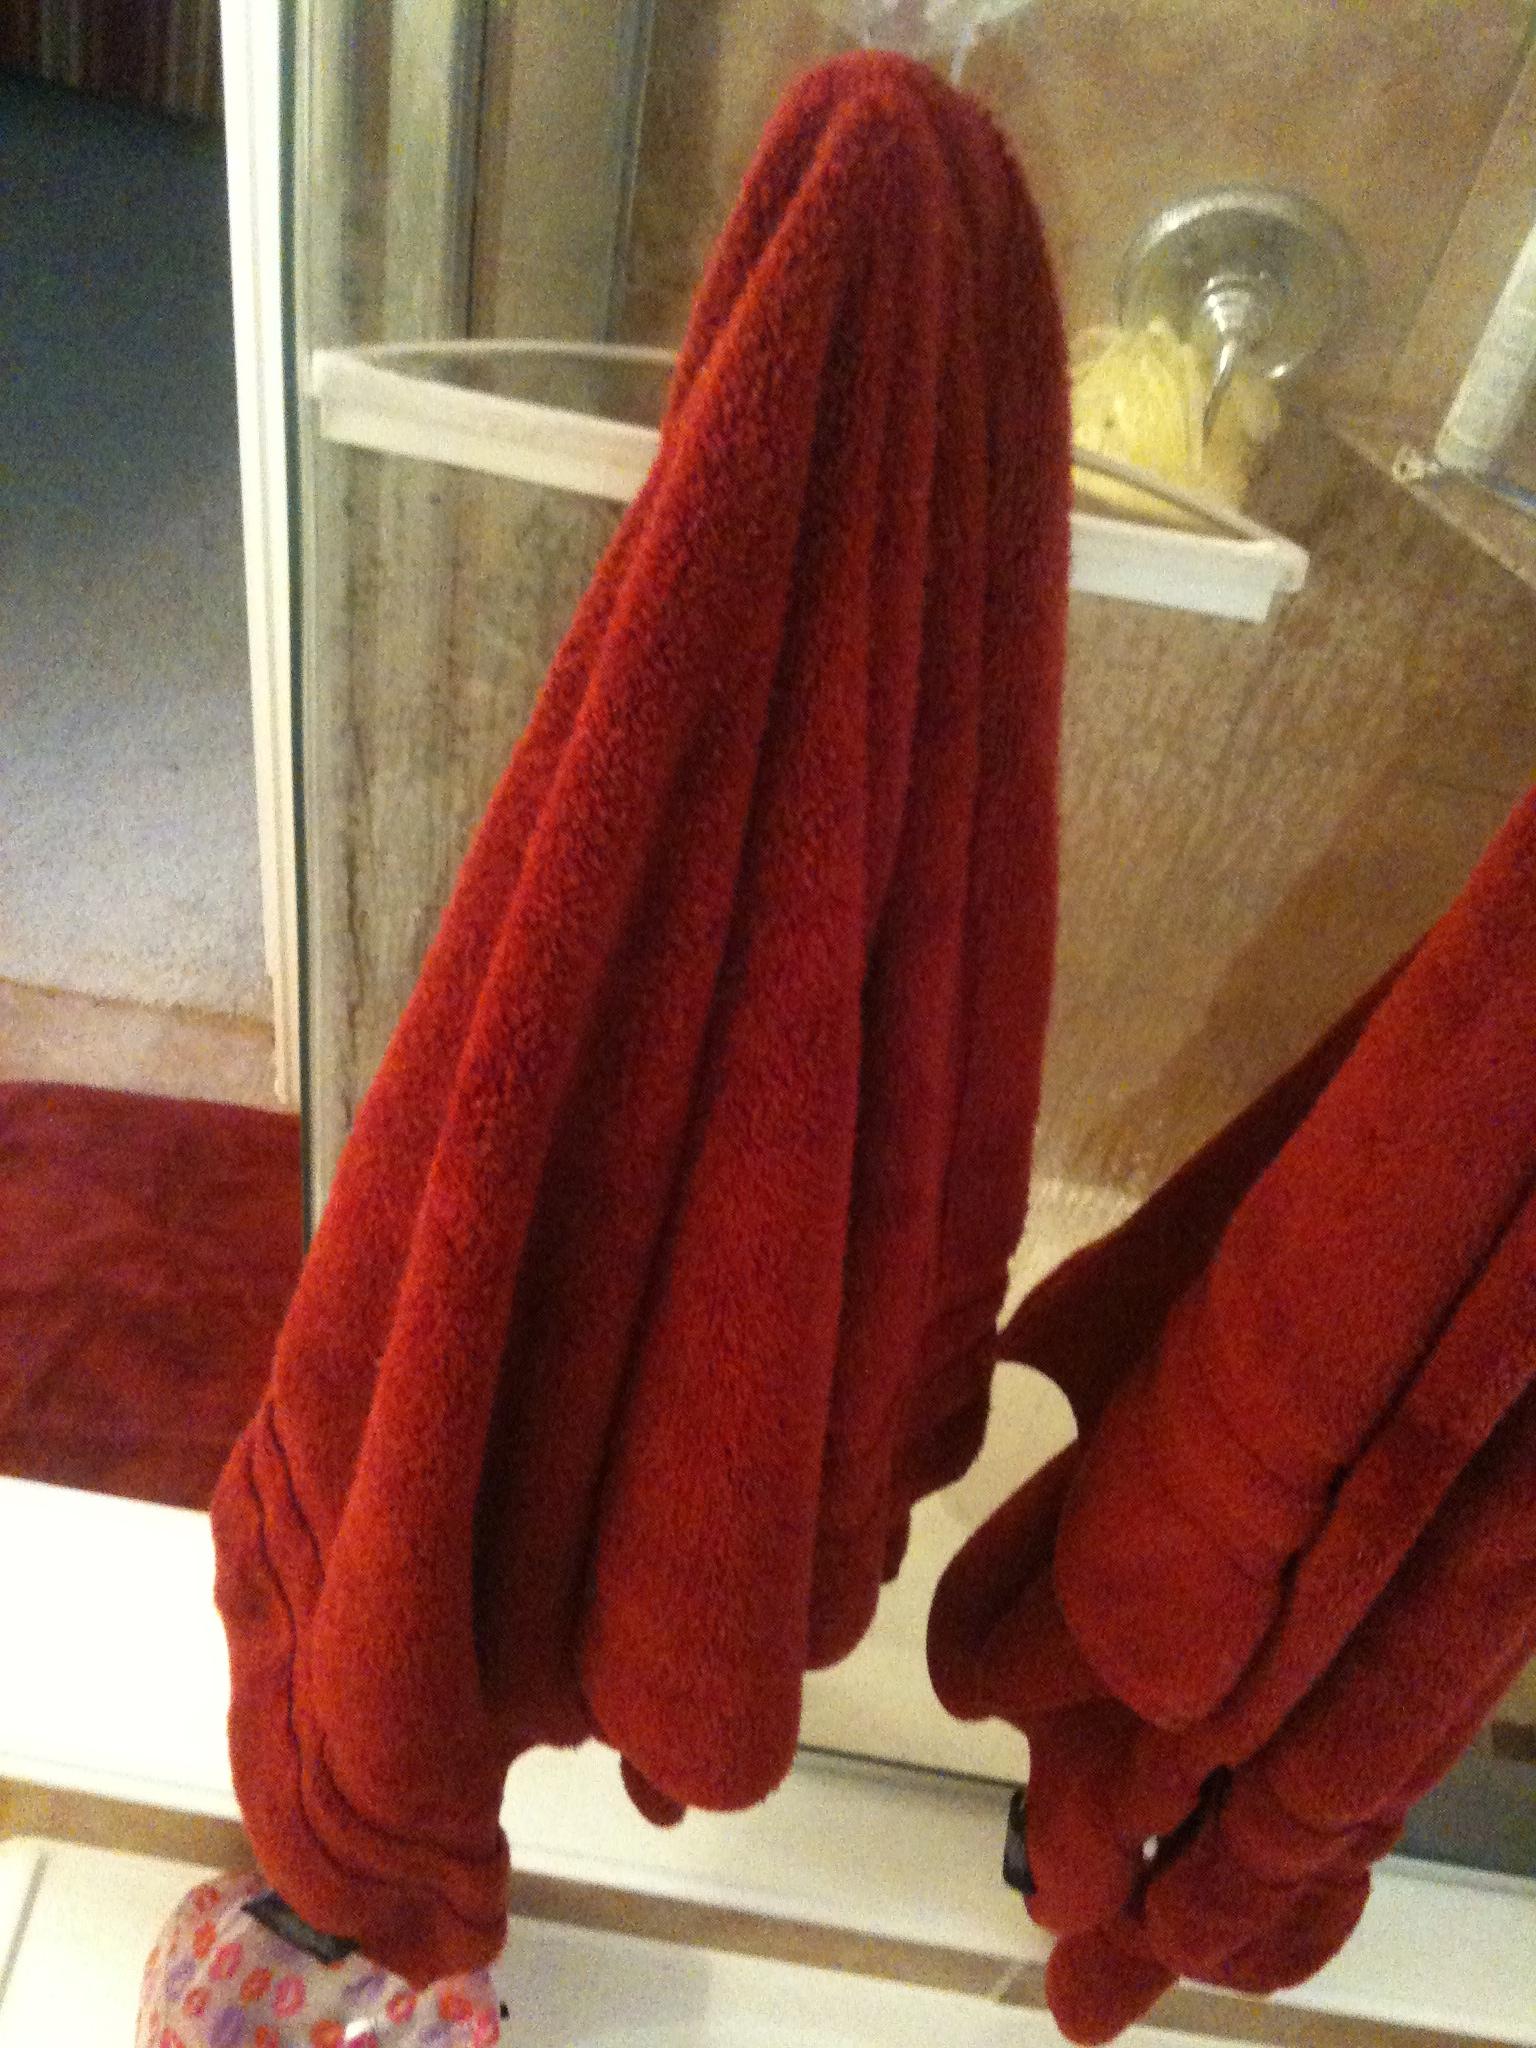 Ode to My Wife's Bath Towel